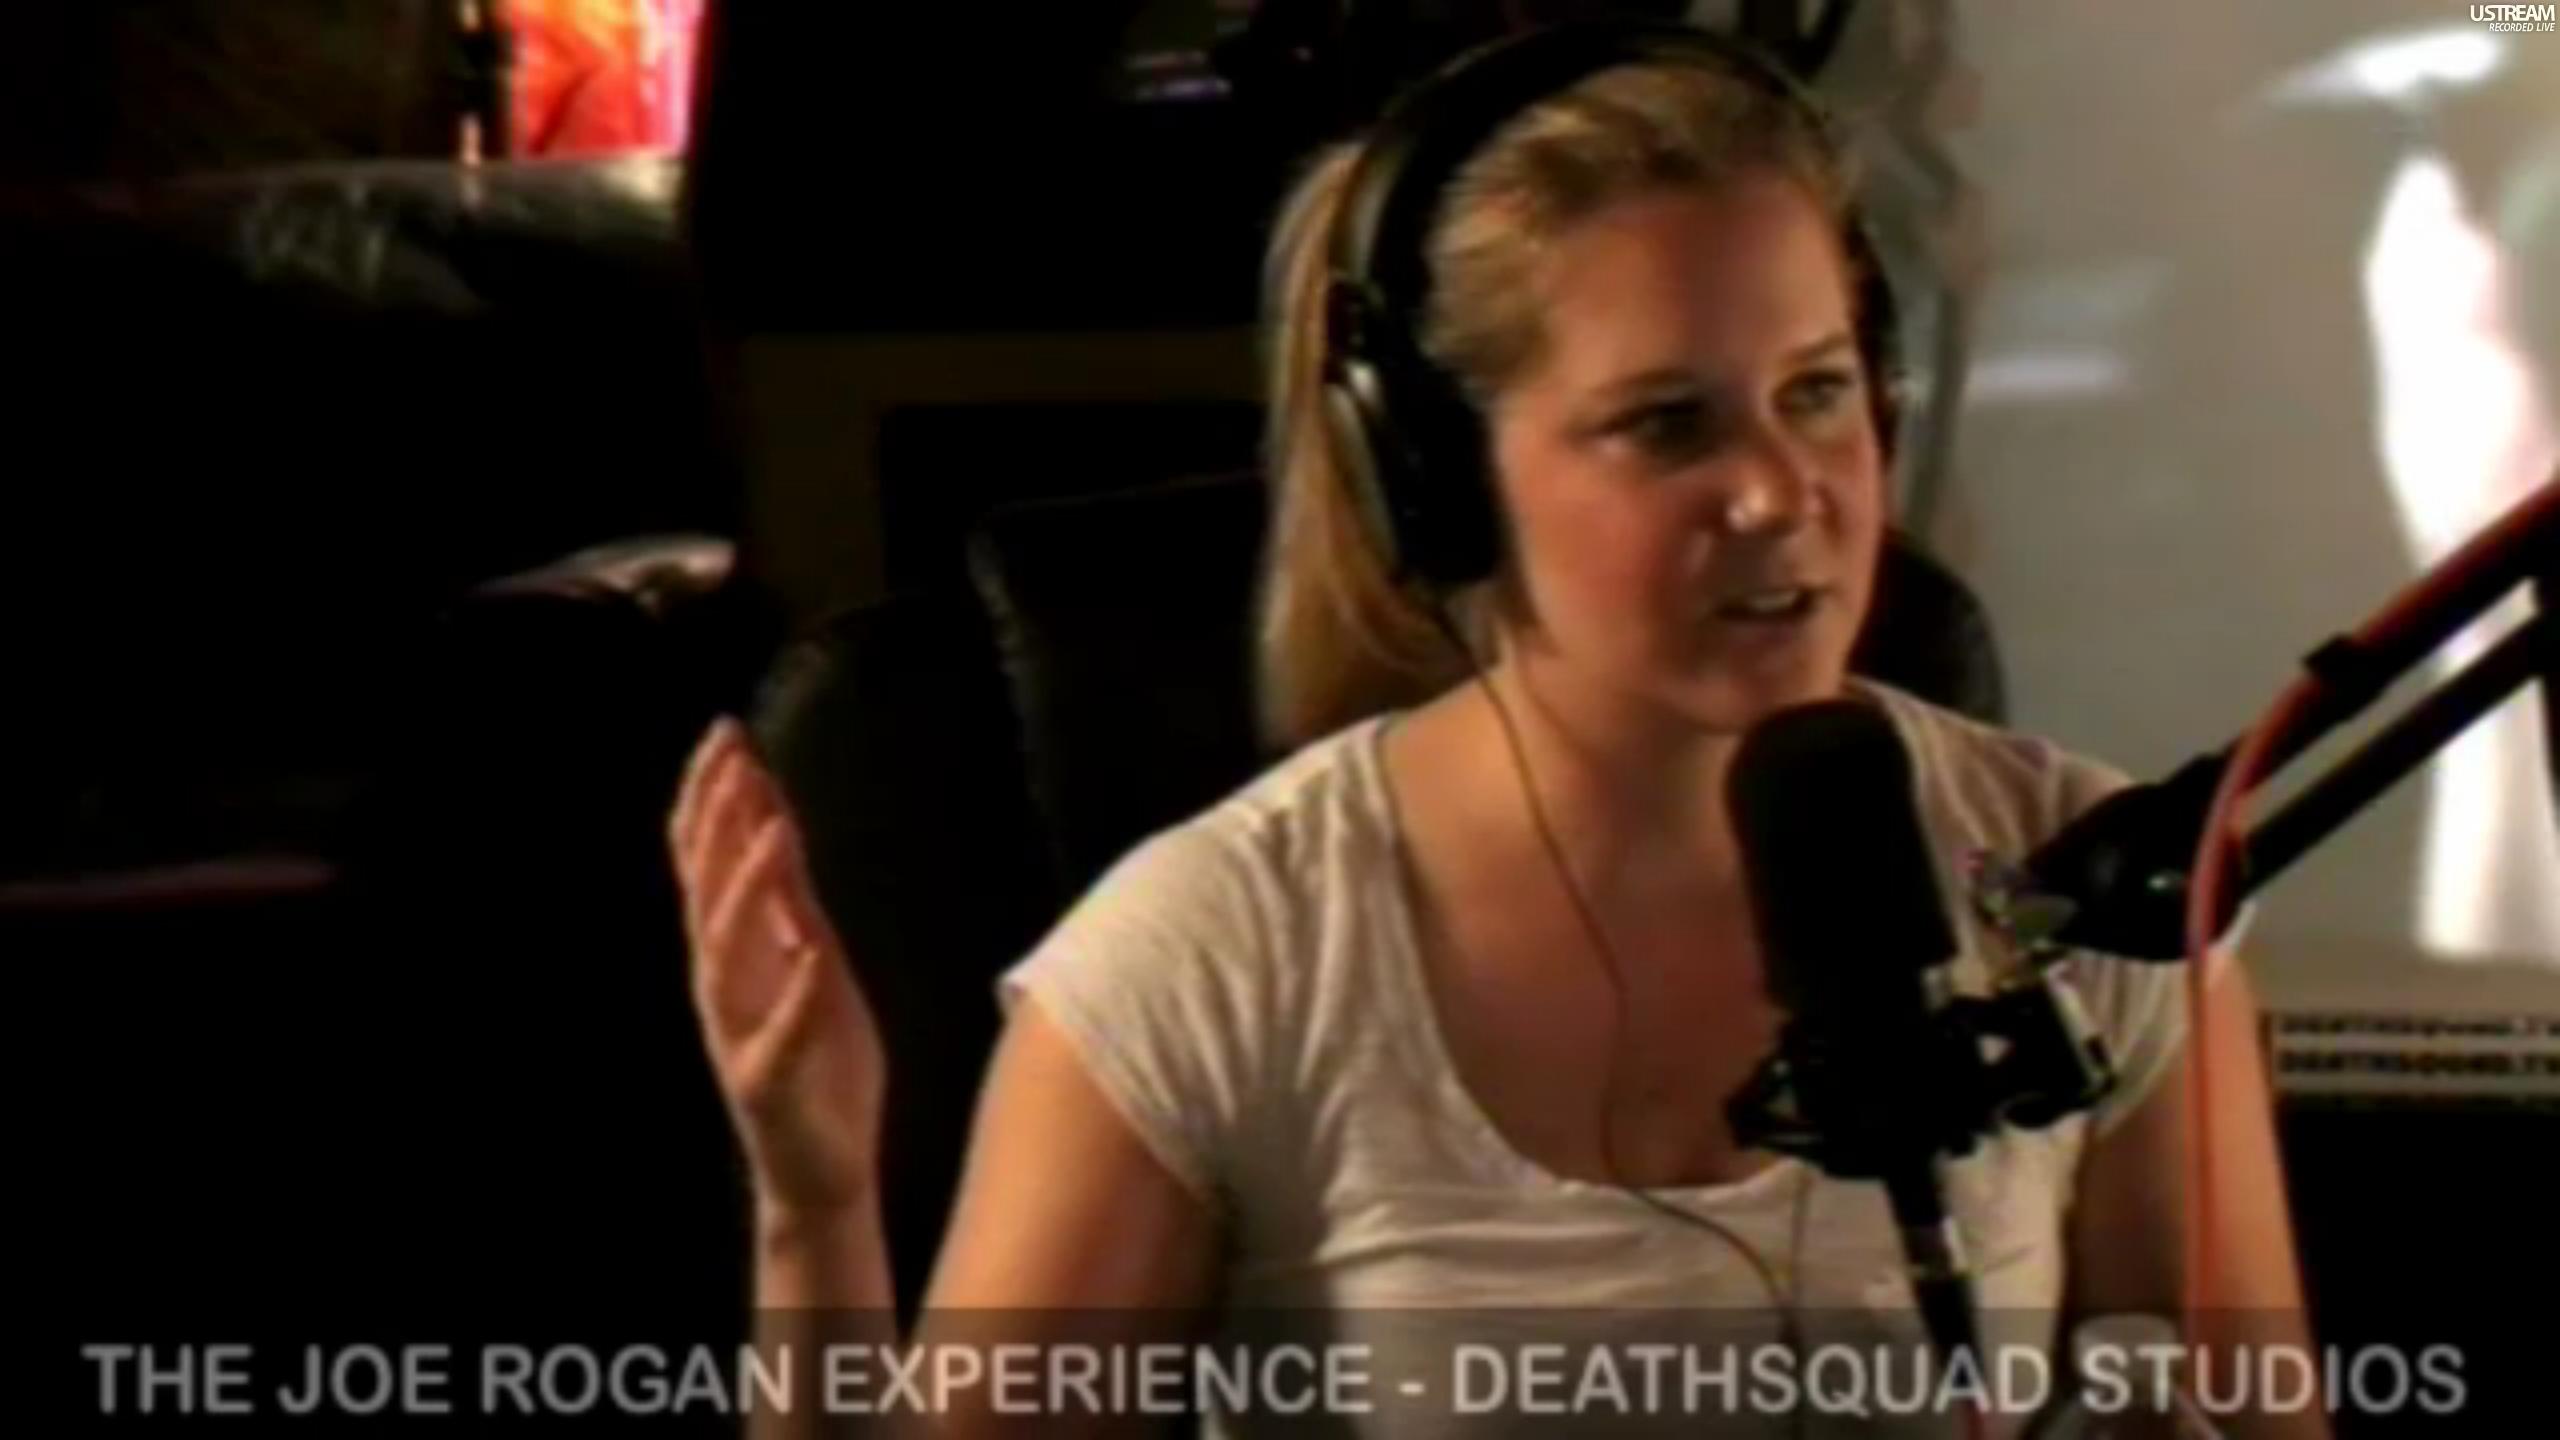 The Joe Rogan Experience #188 - Amy Schumer, Brian Redban